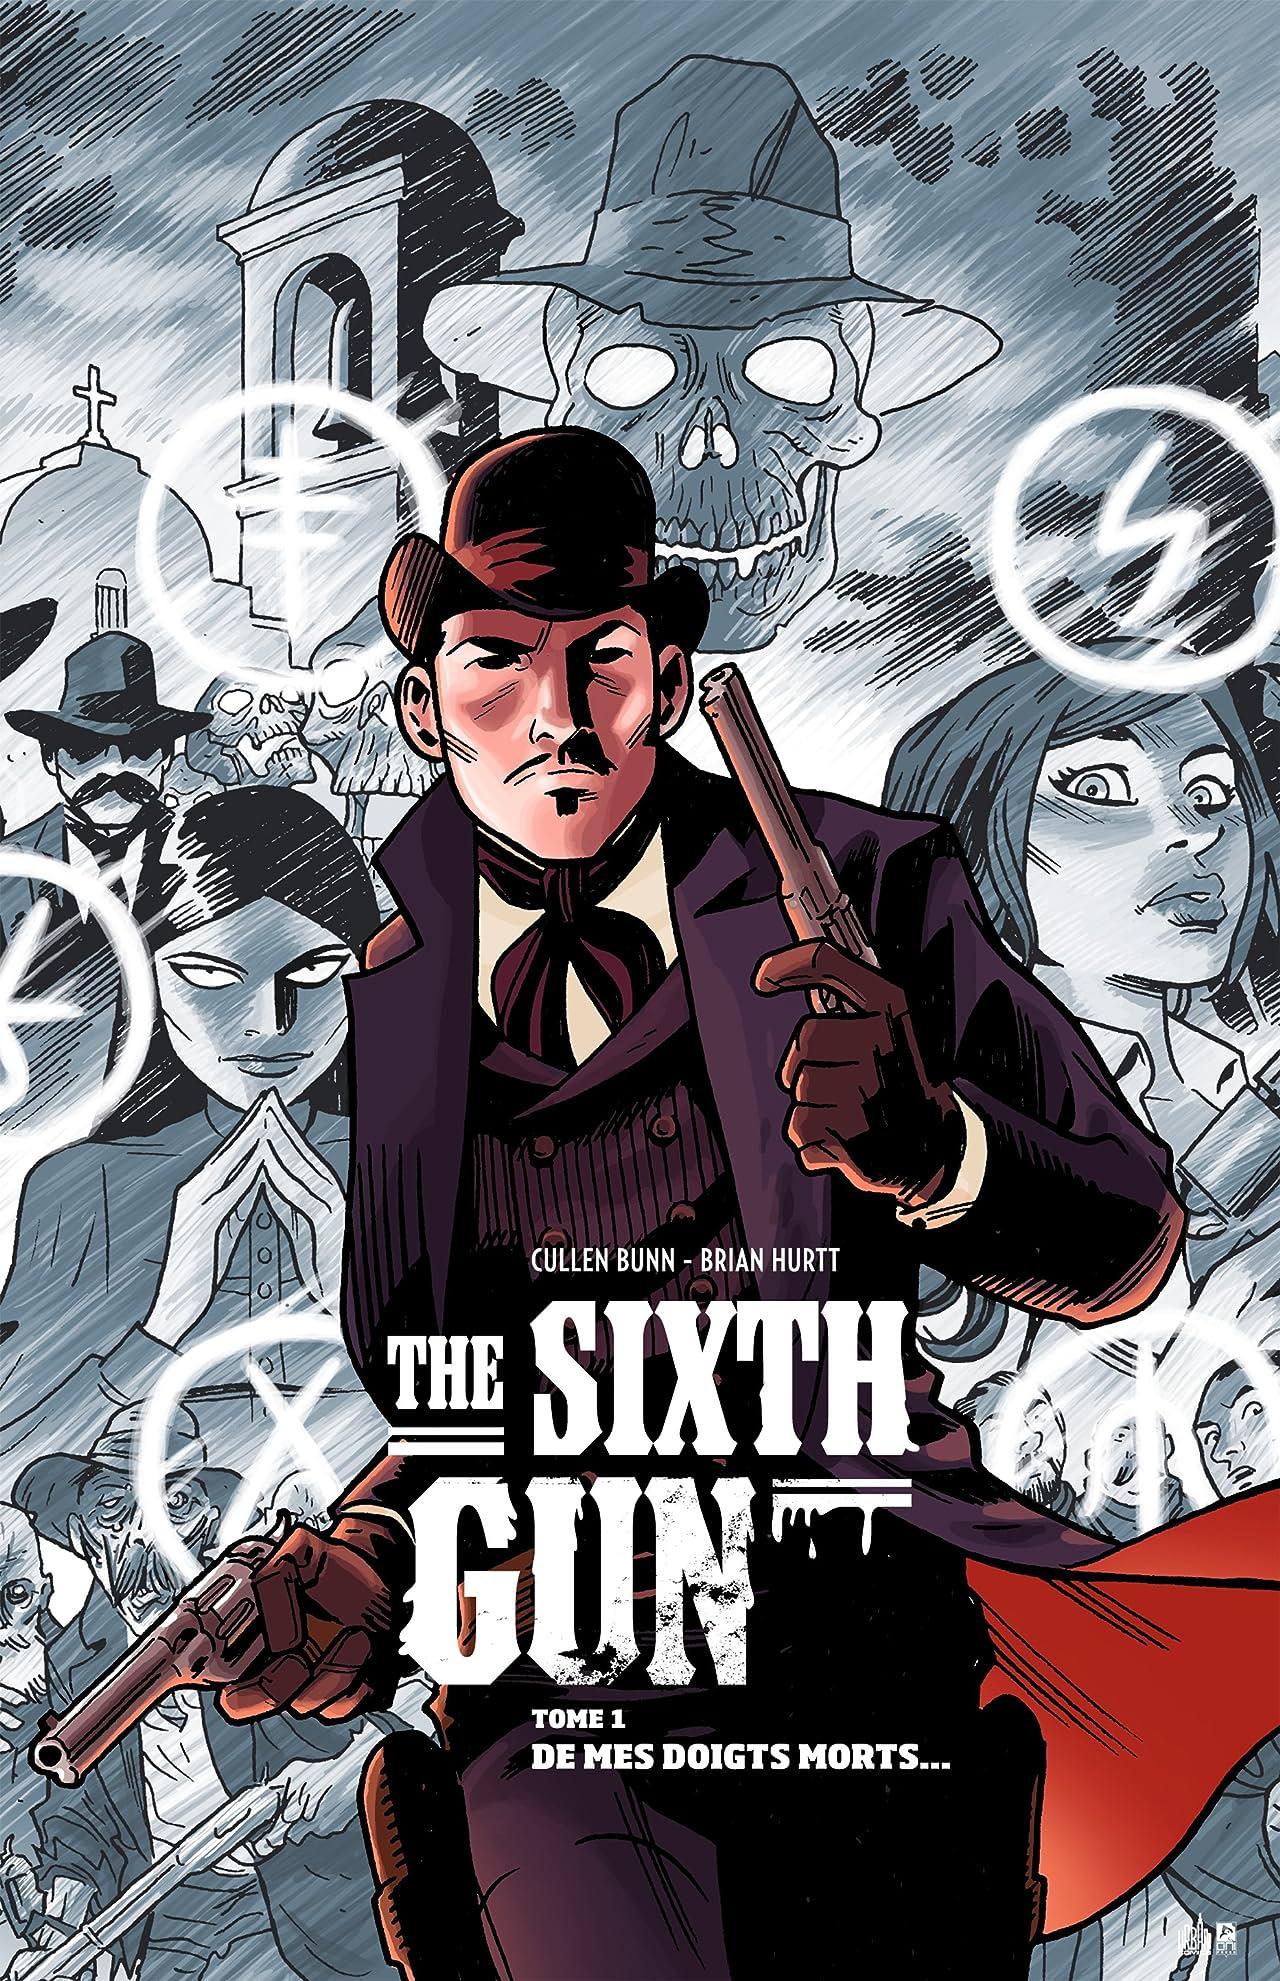 The Sixth Gun Vol. 1